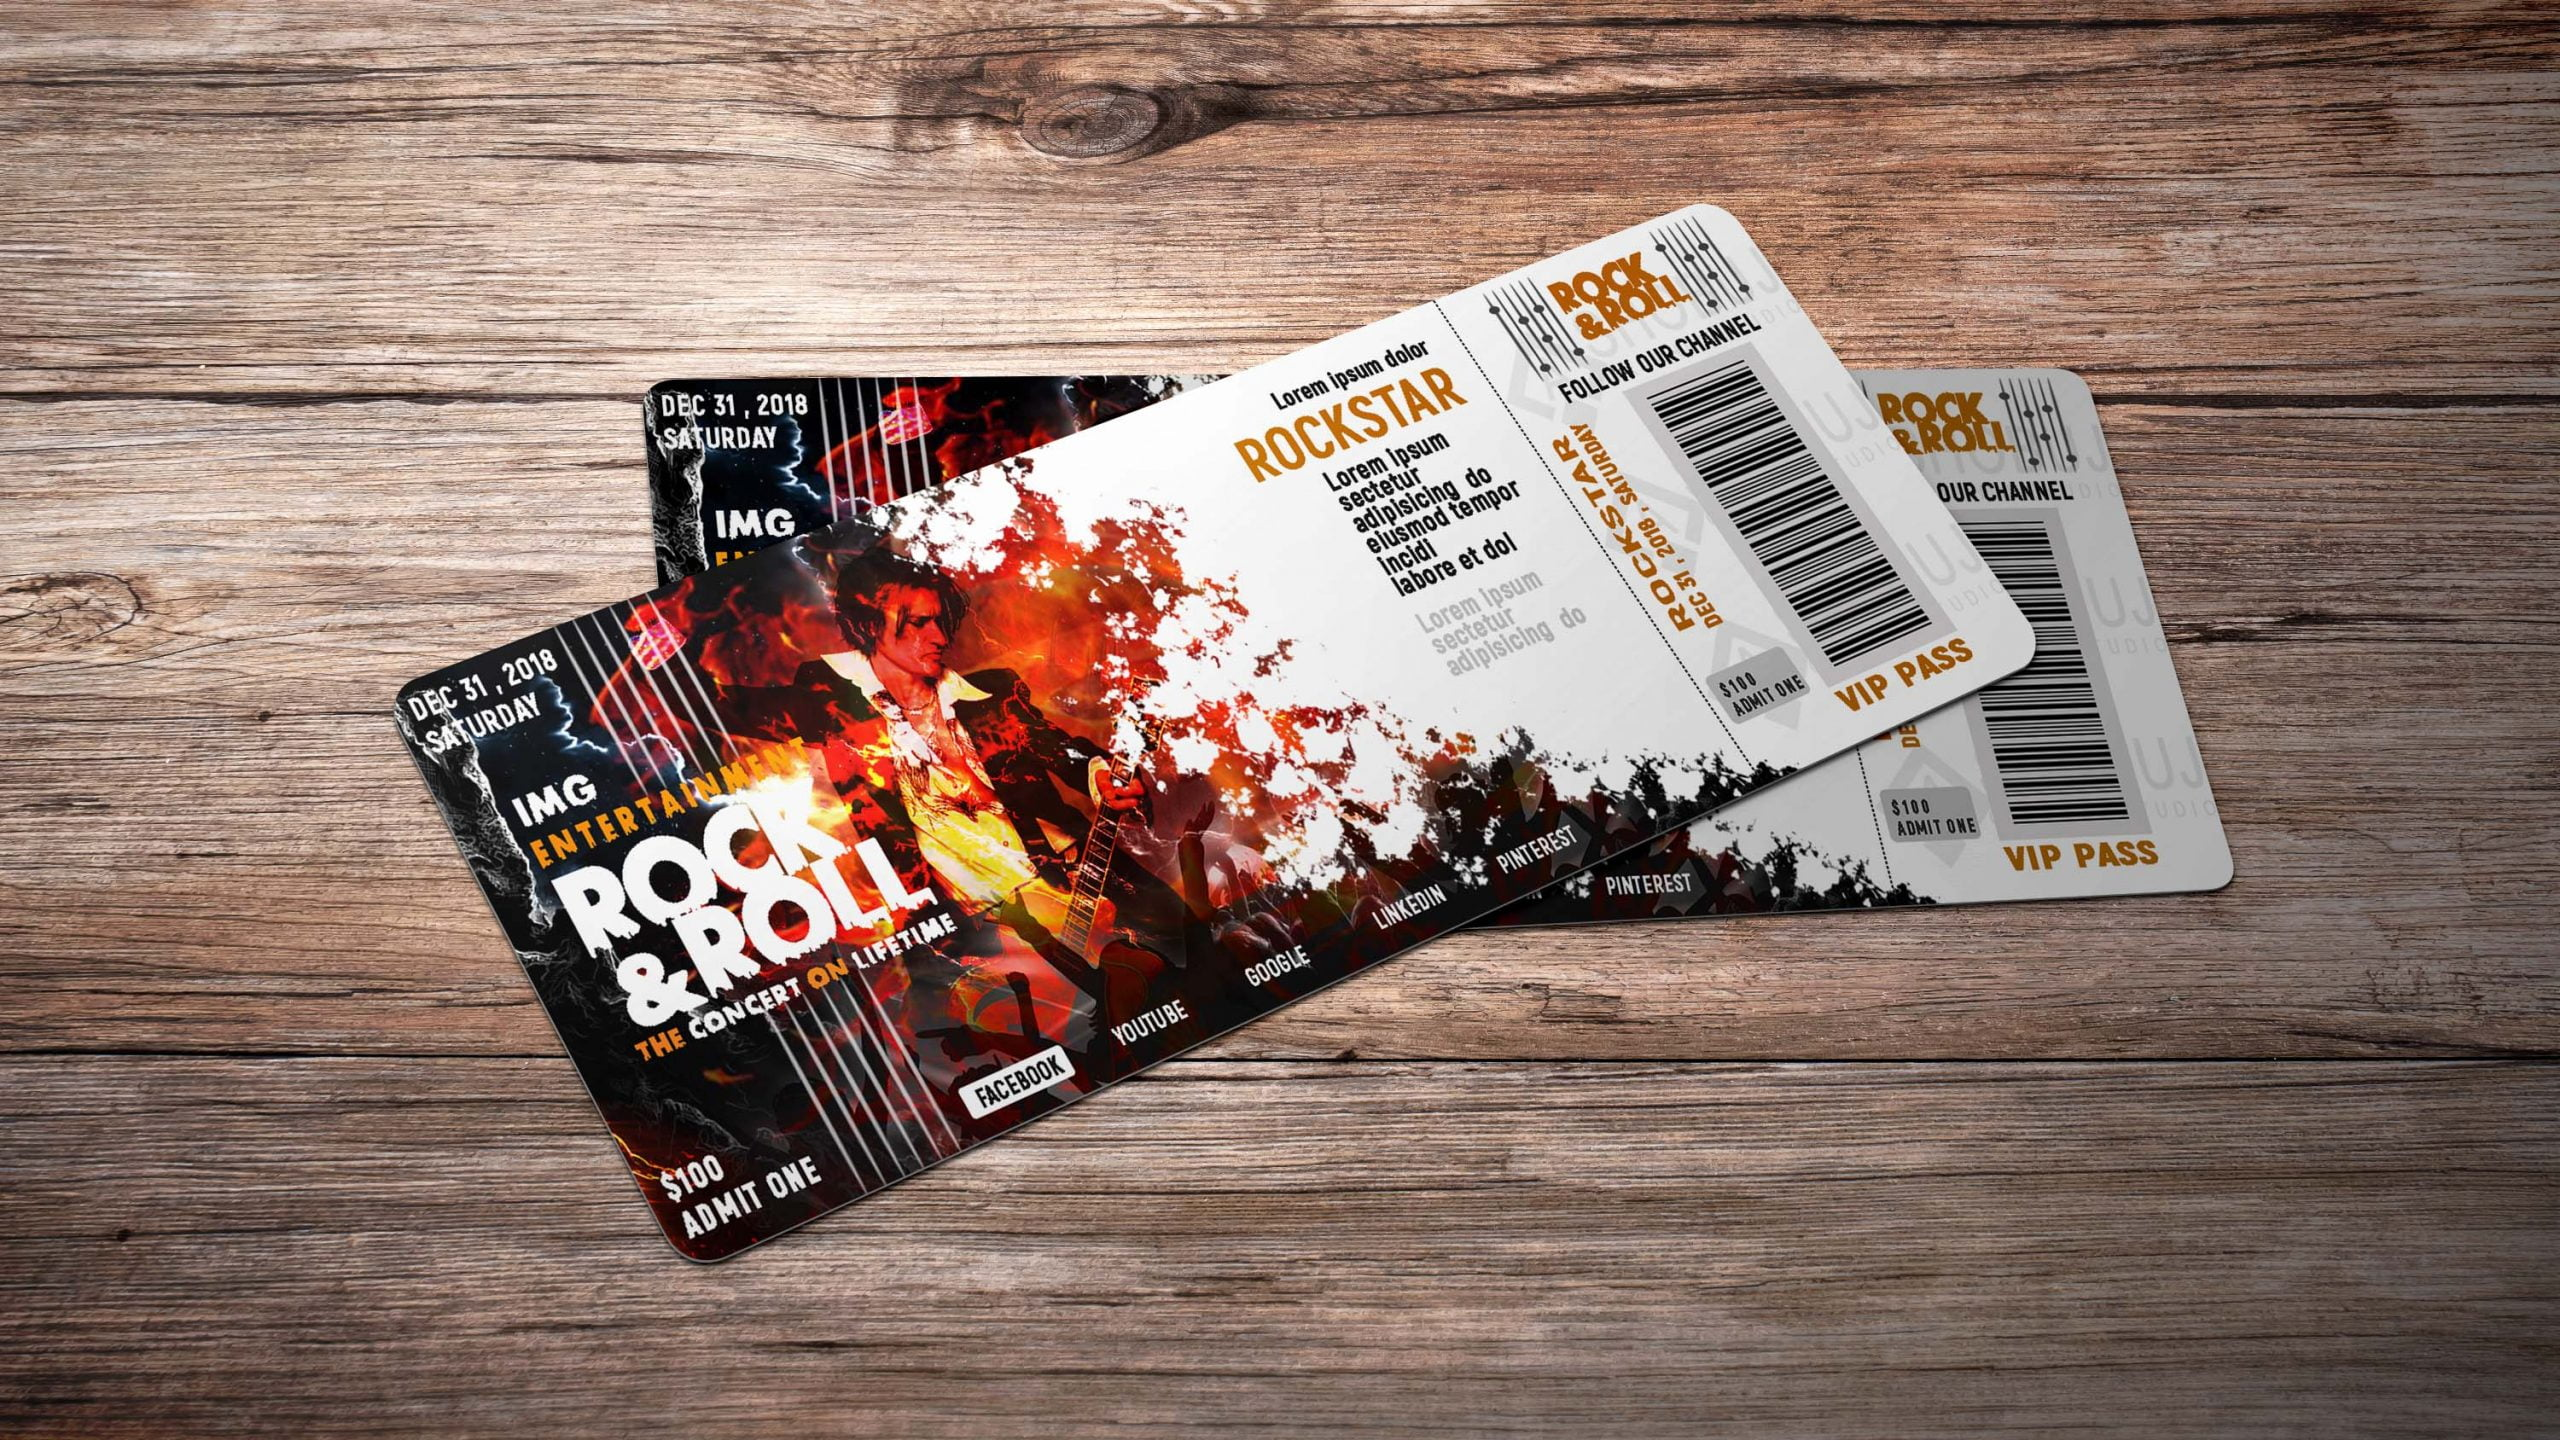 ROCK N ROLL EVENT TICKET DESIGN